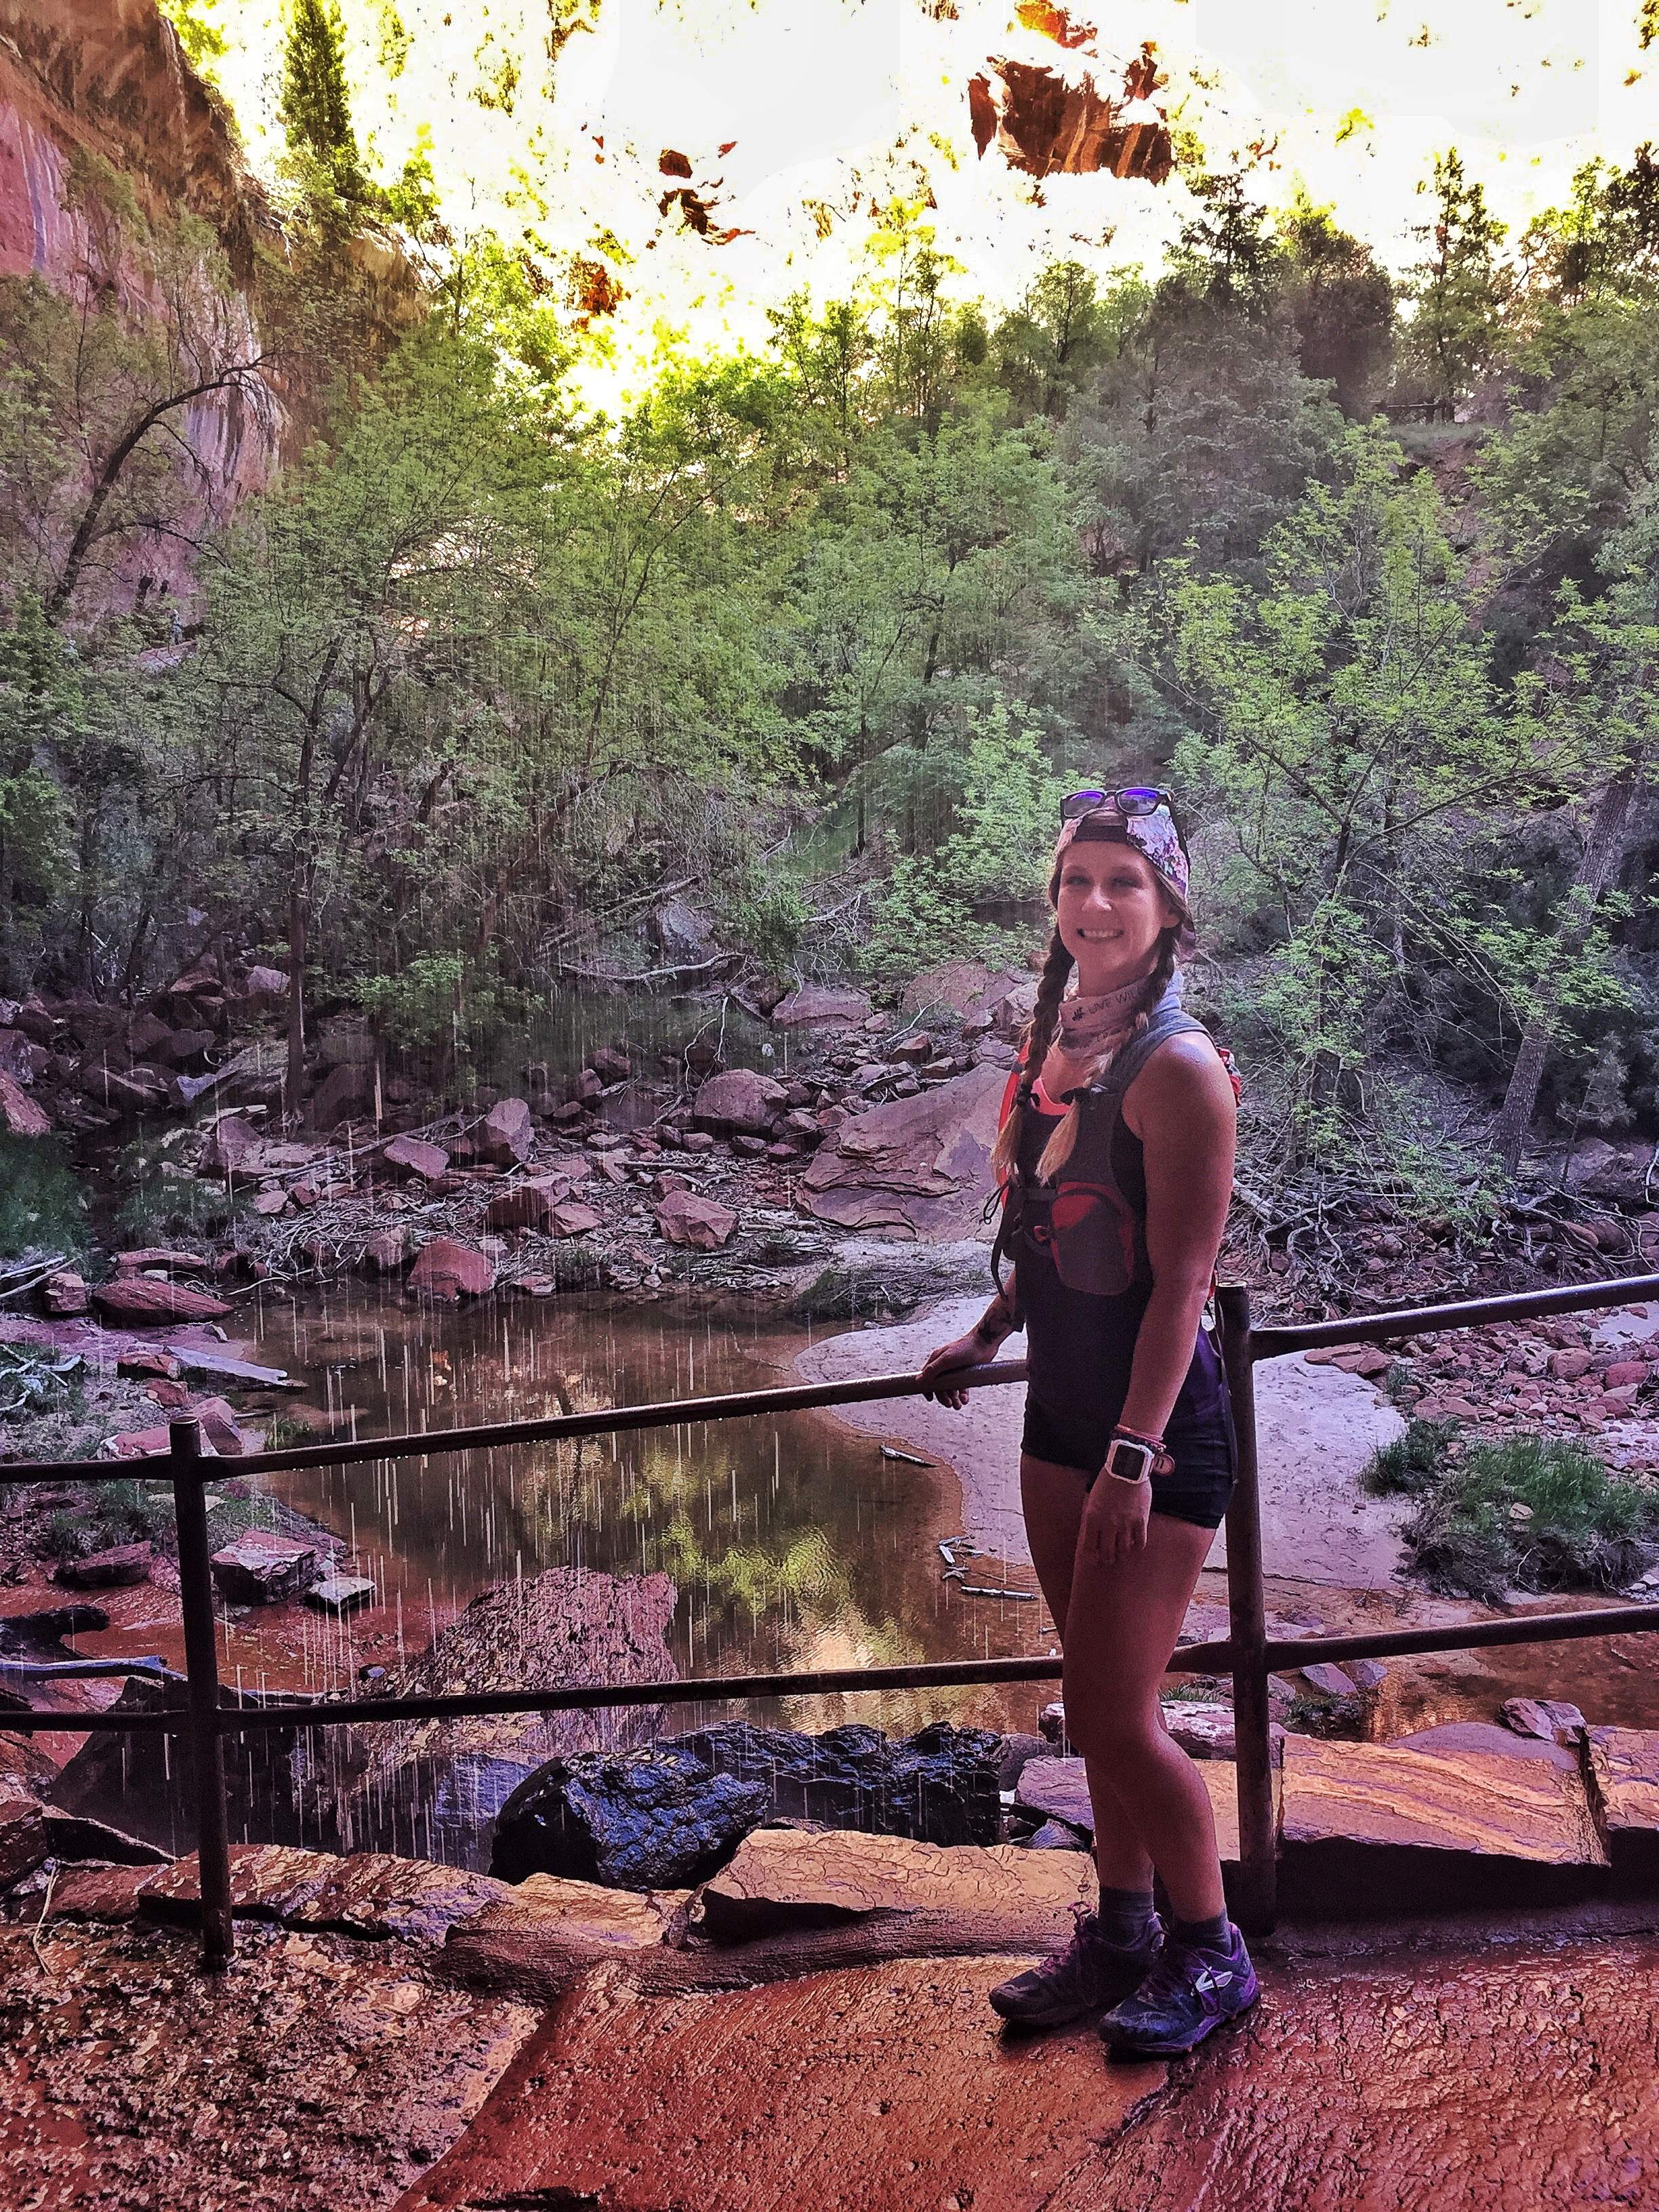 More sad rocks. Lower Emerald Pools, Zion National Park.